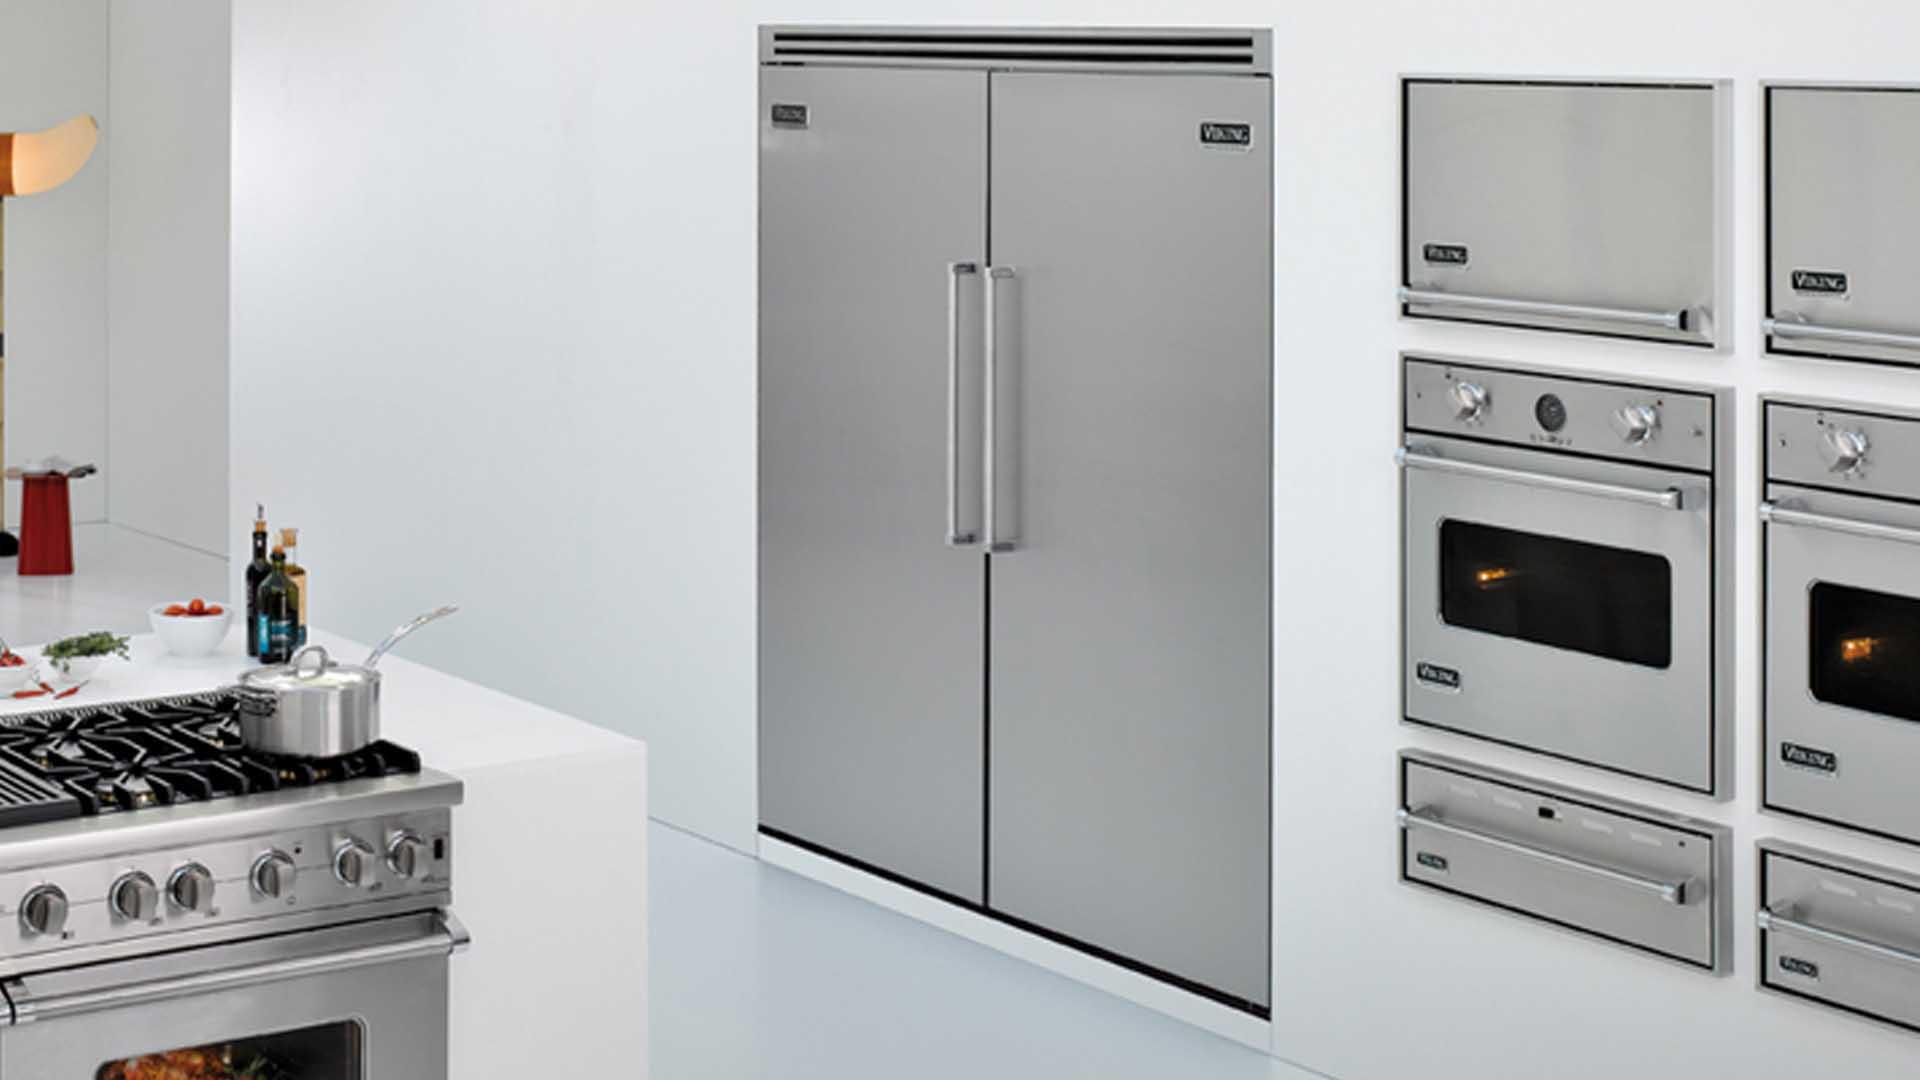 Viking Freestanding All Freezer Refrigerator Repair Service   Viking Appliance Repairs